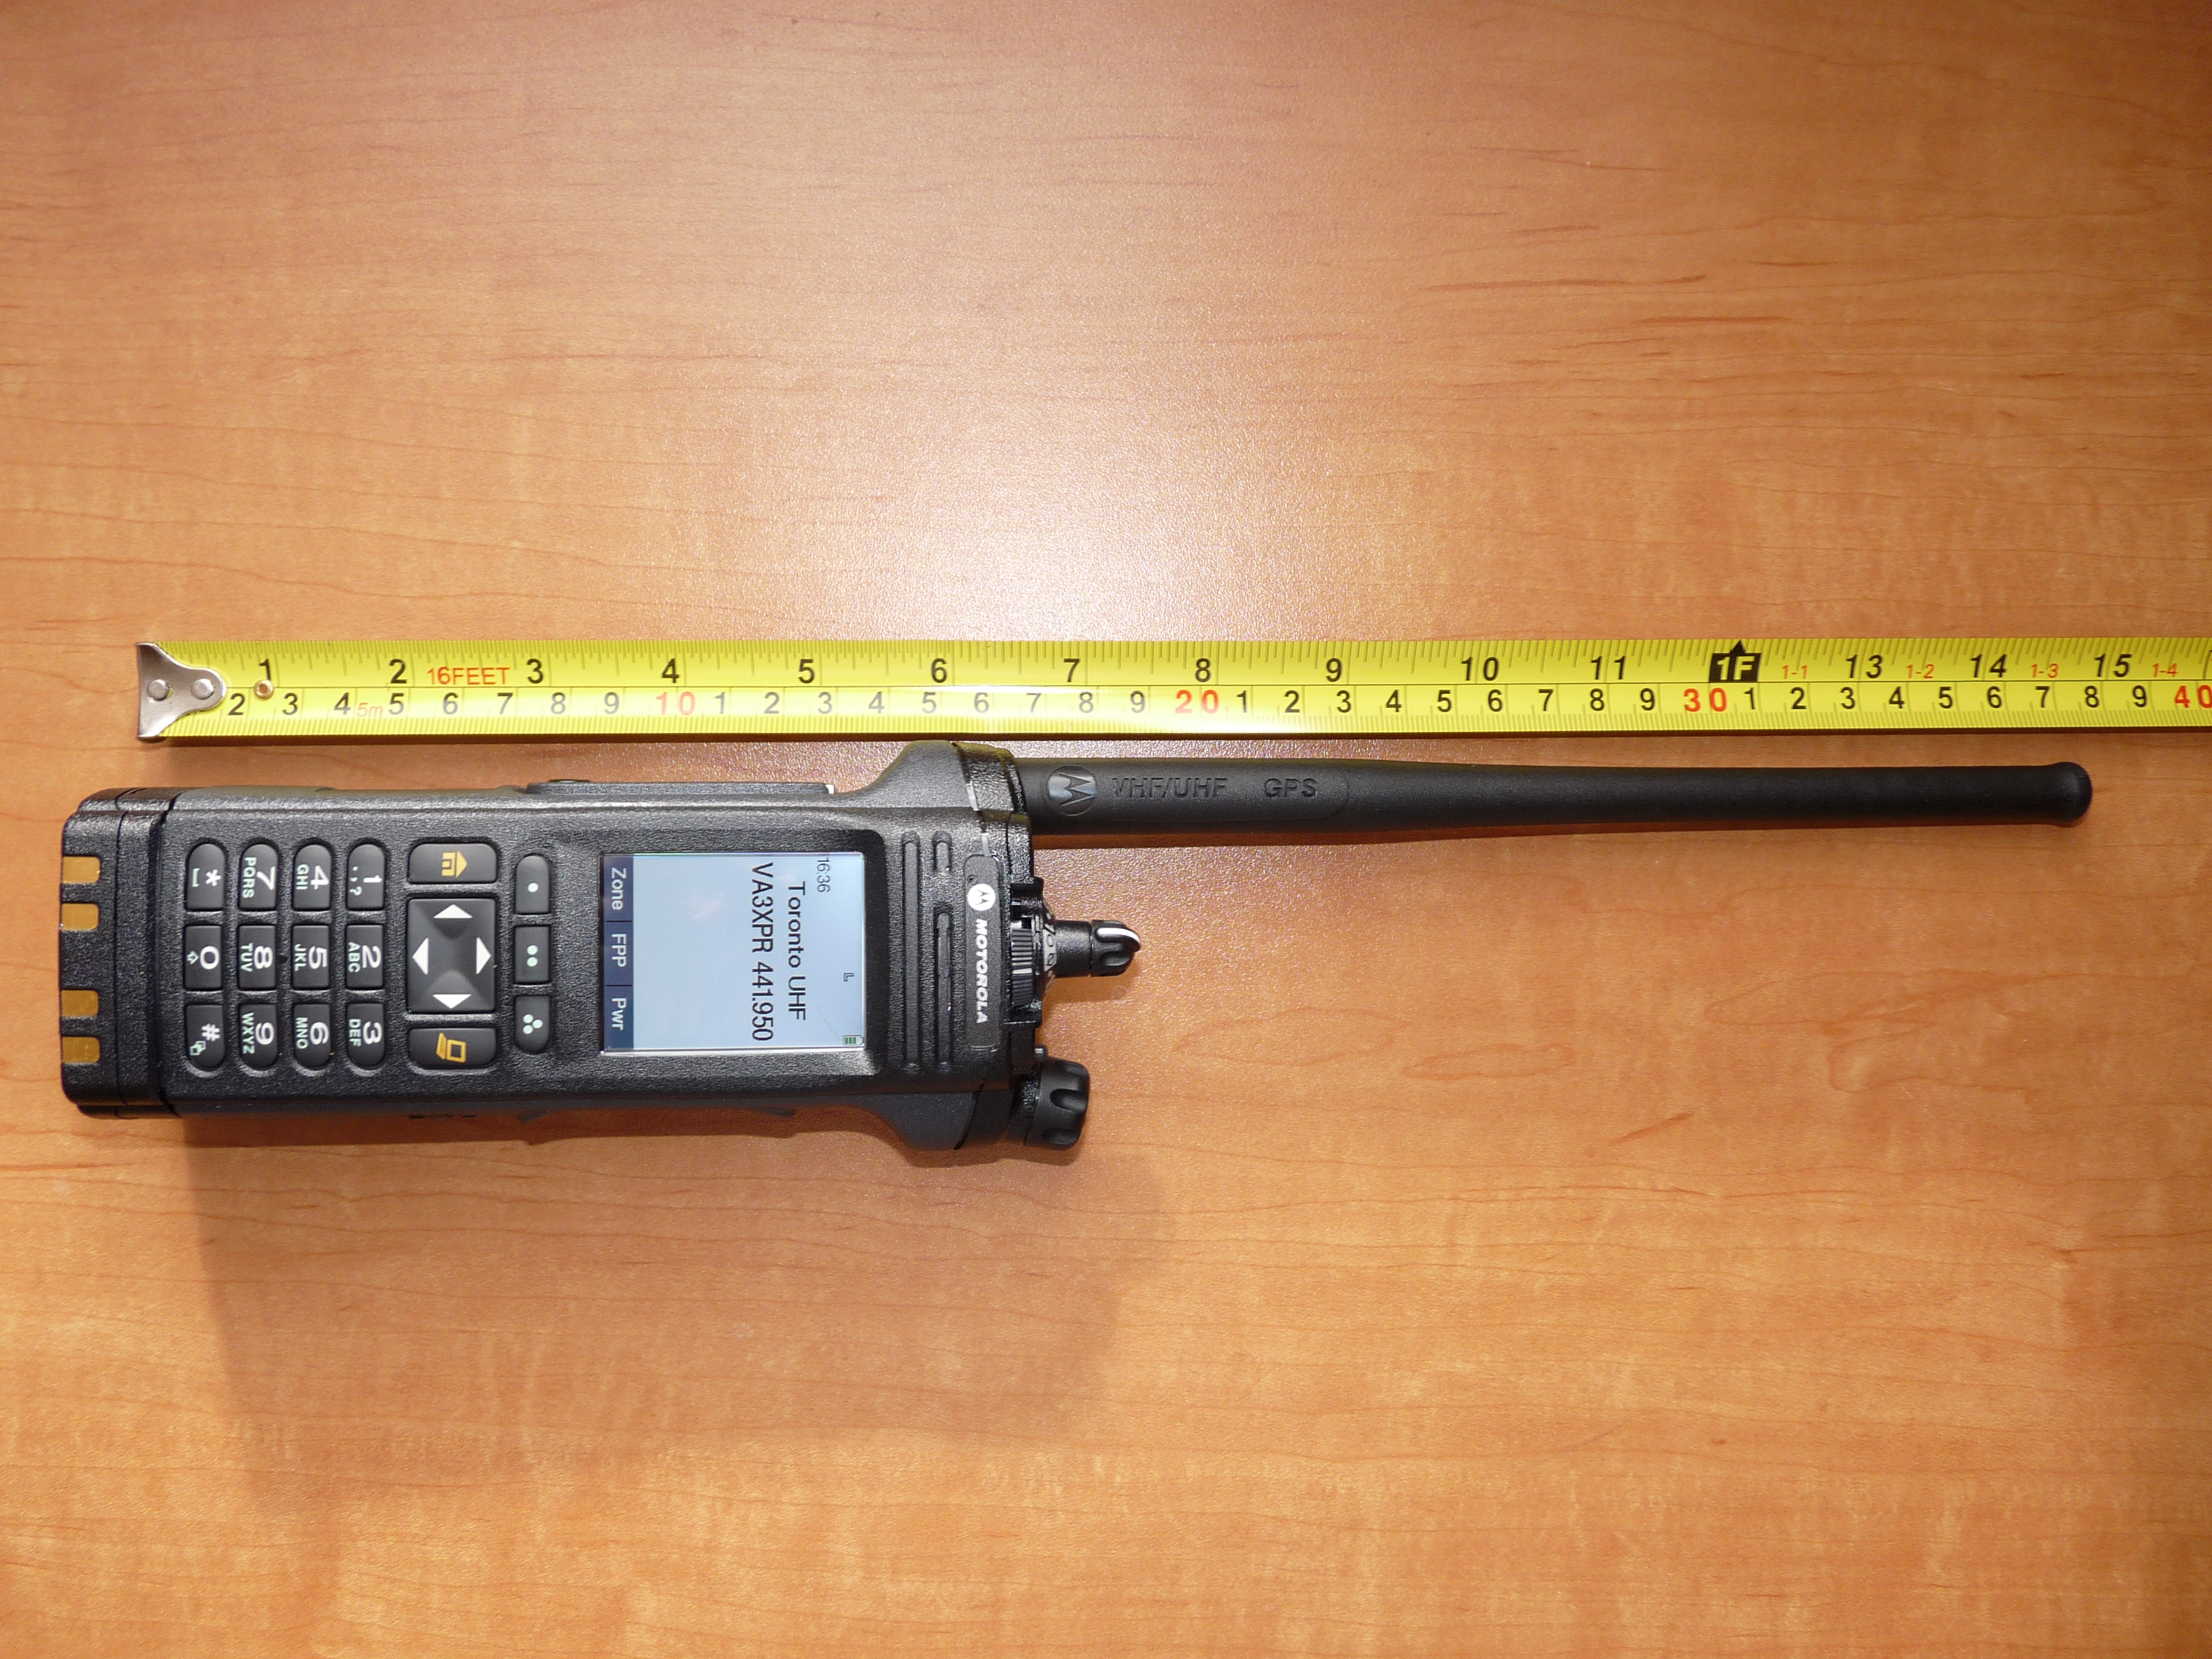 Motorola astro portable cps r14 00 00 :: perhoteta